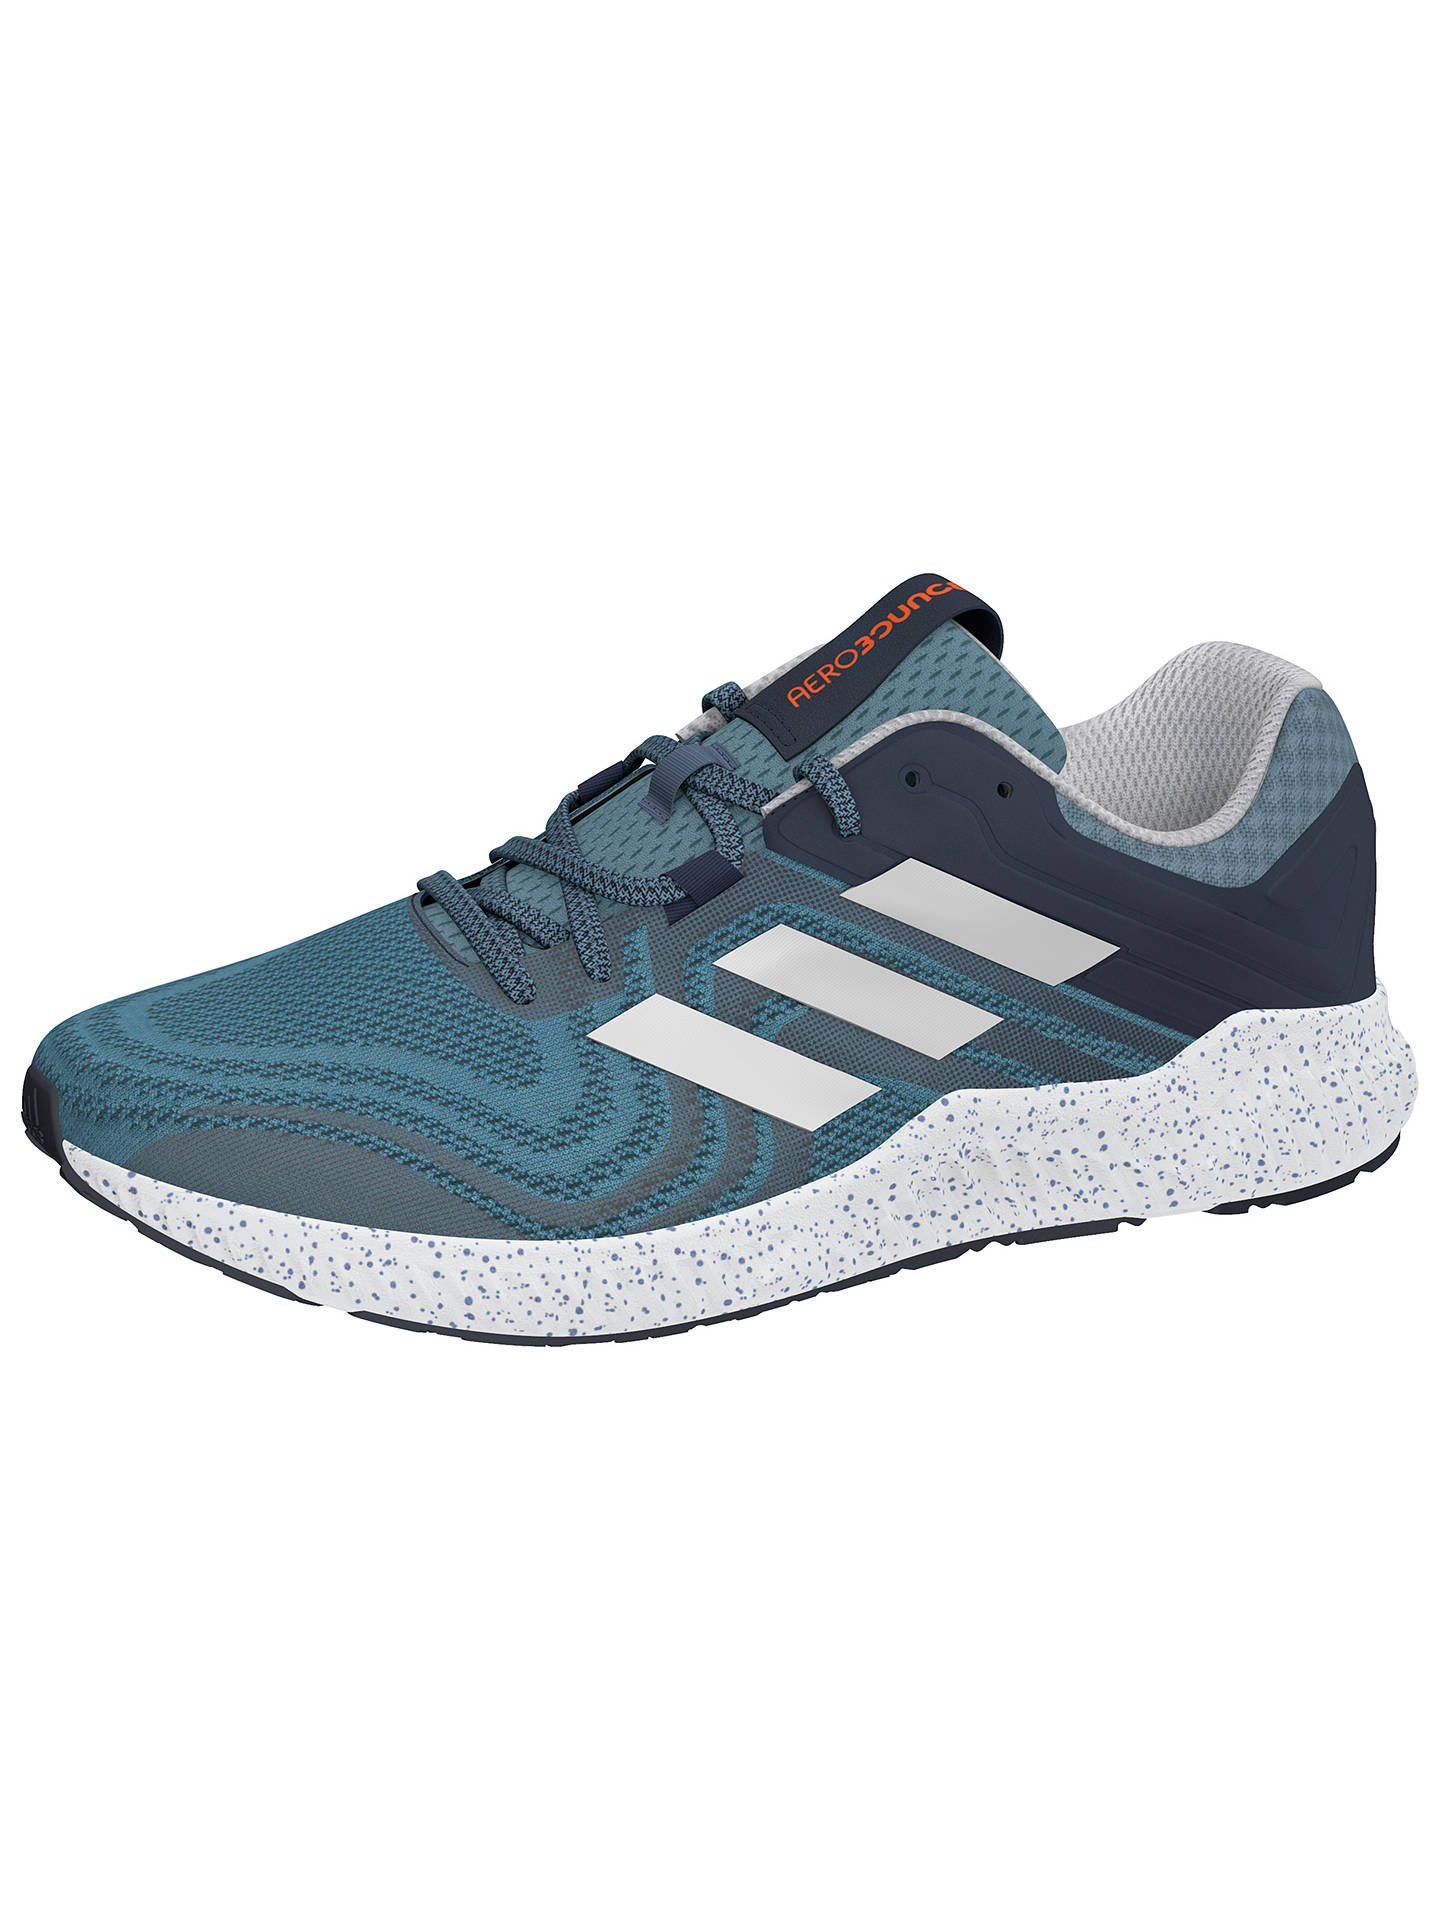 adidas Aerobounce Men's Running Shoes, Hi-Res Blue/Silver